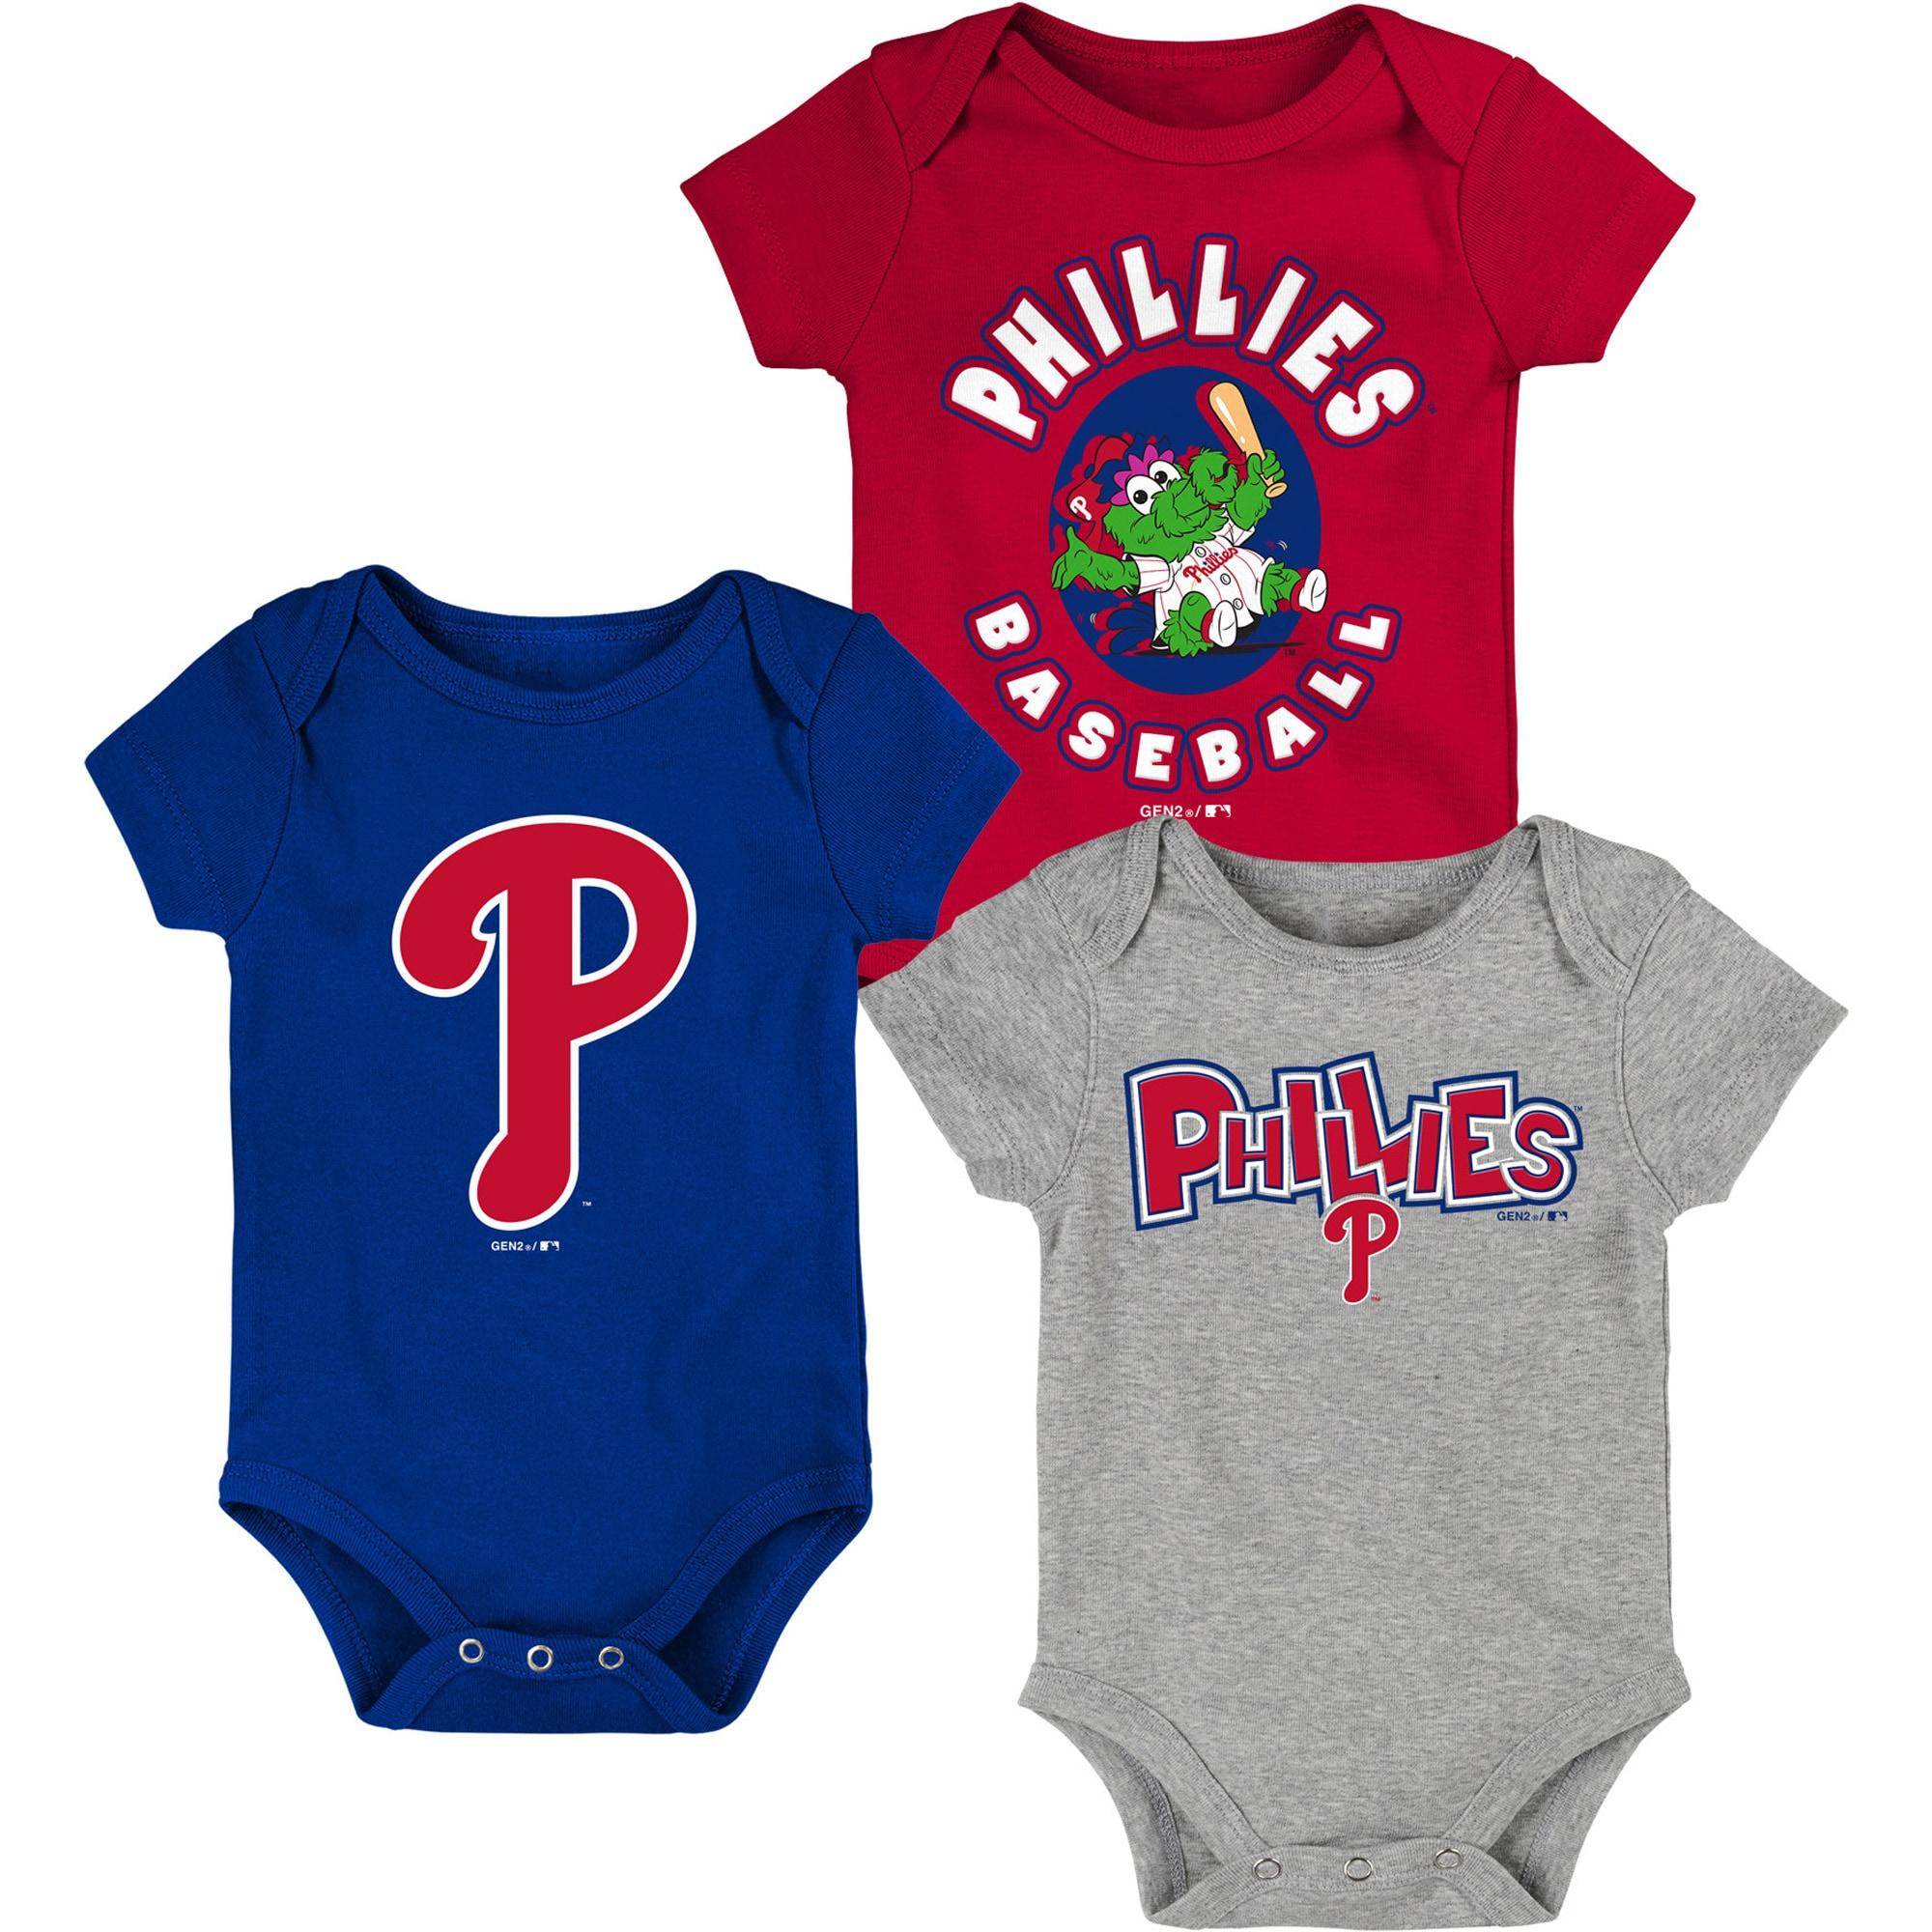 Philadelphia Phillies Infant Everyday Fan Three-Pack Bodysuit Set - Red/Royal/Heathered Gray